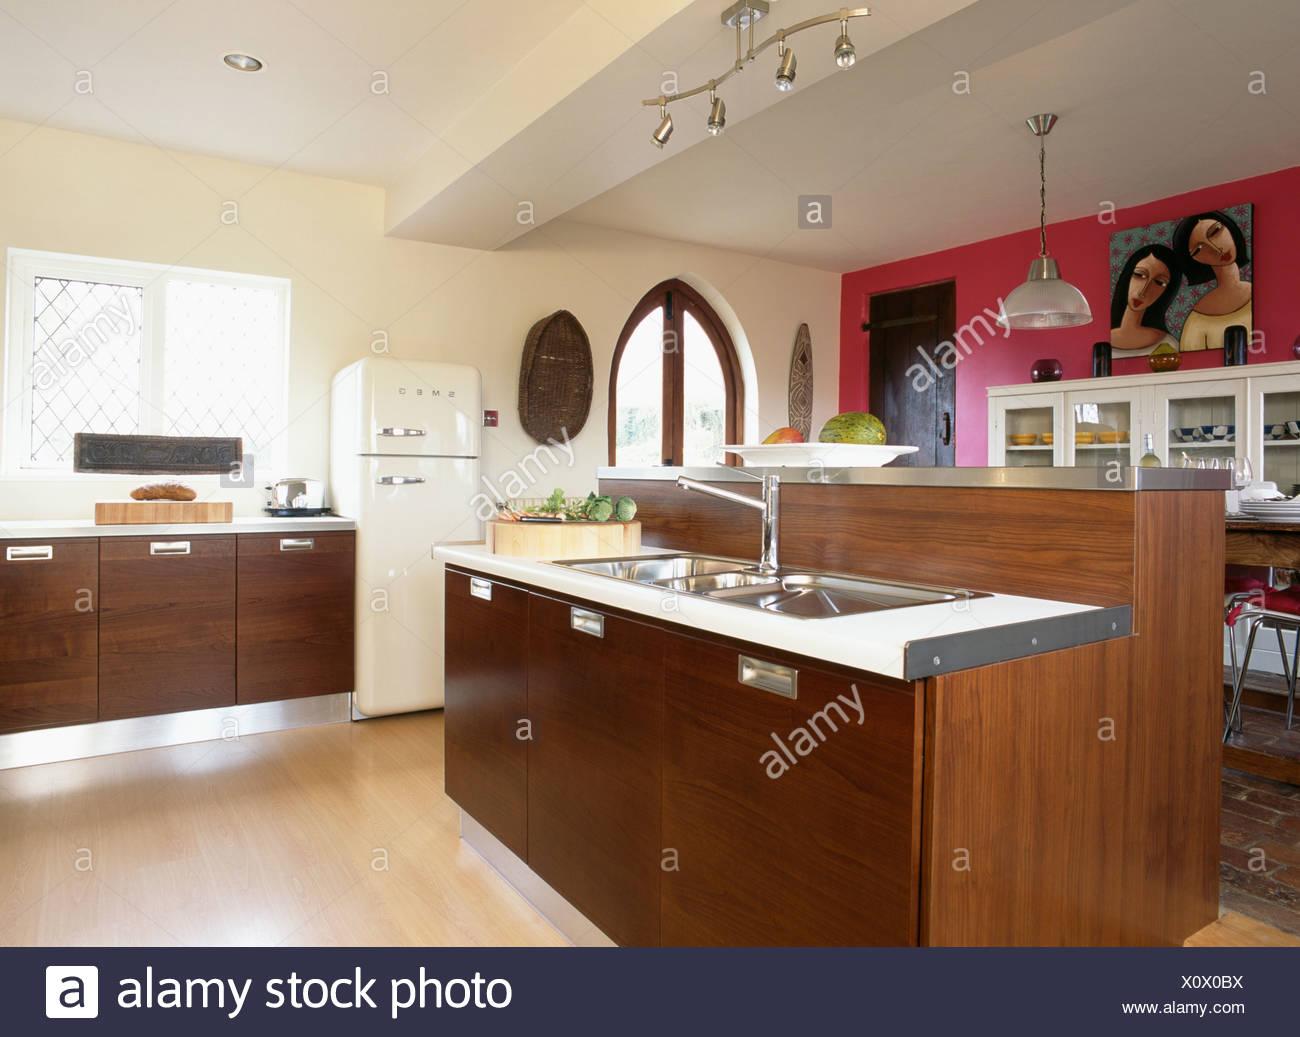 Cucina Legno E Acciaio | Cucina In Legno Di Recupero E Tubi In ...